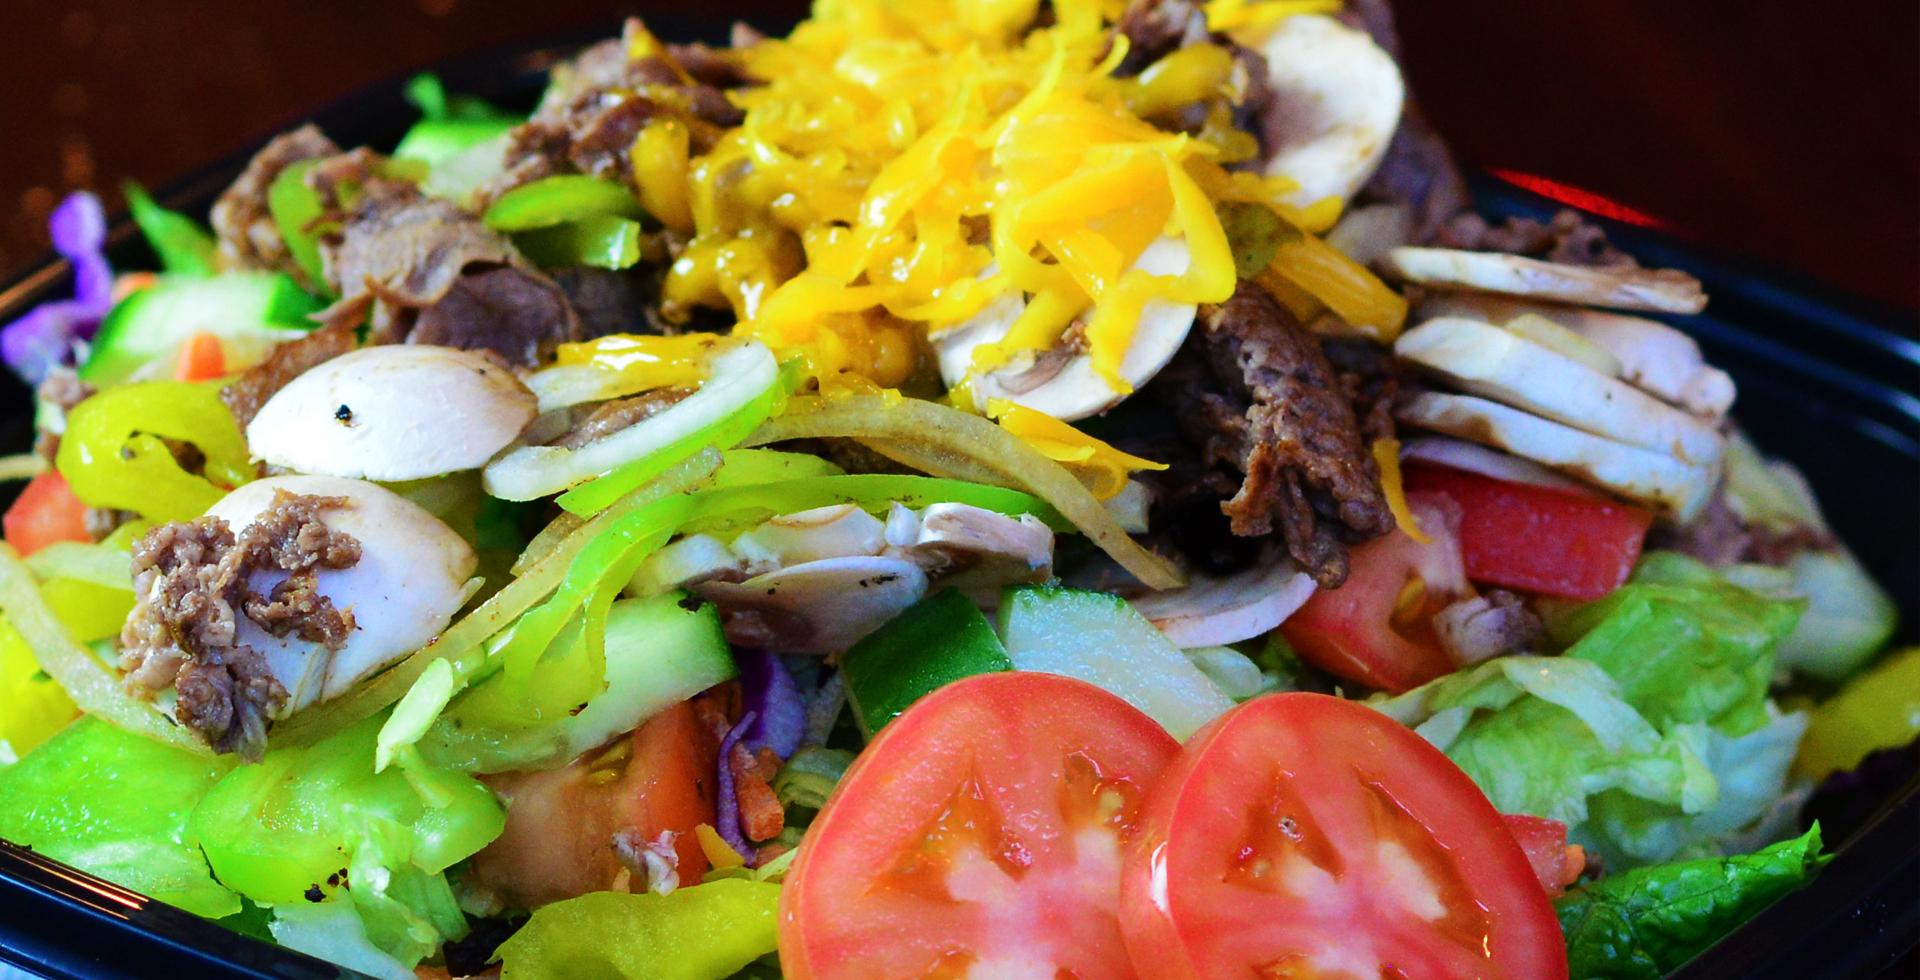 Sizzlin' Salad Image